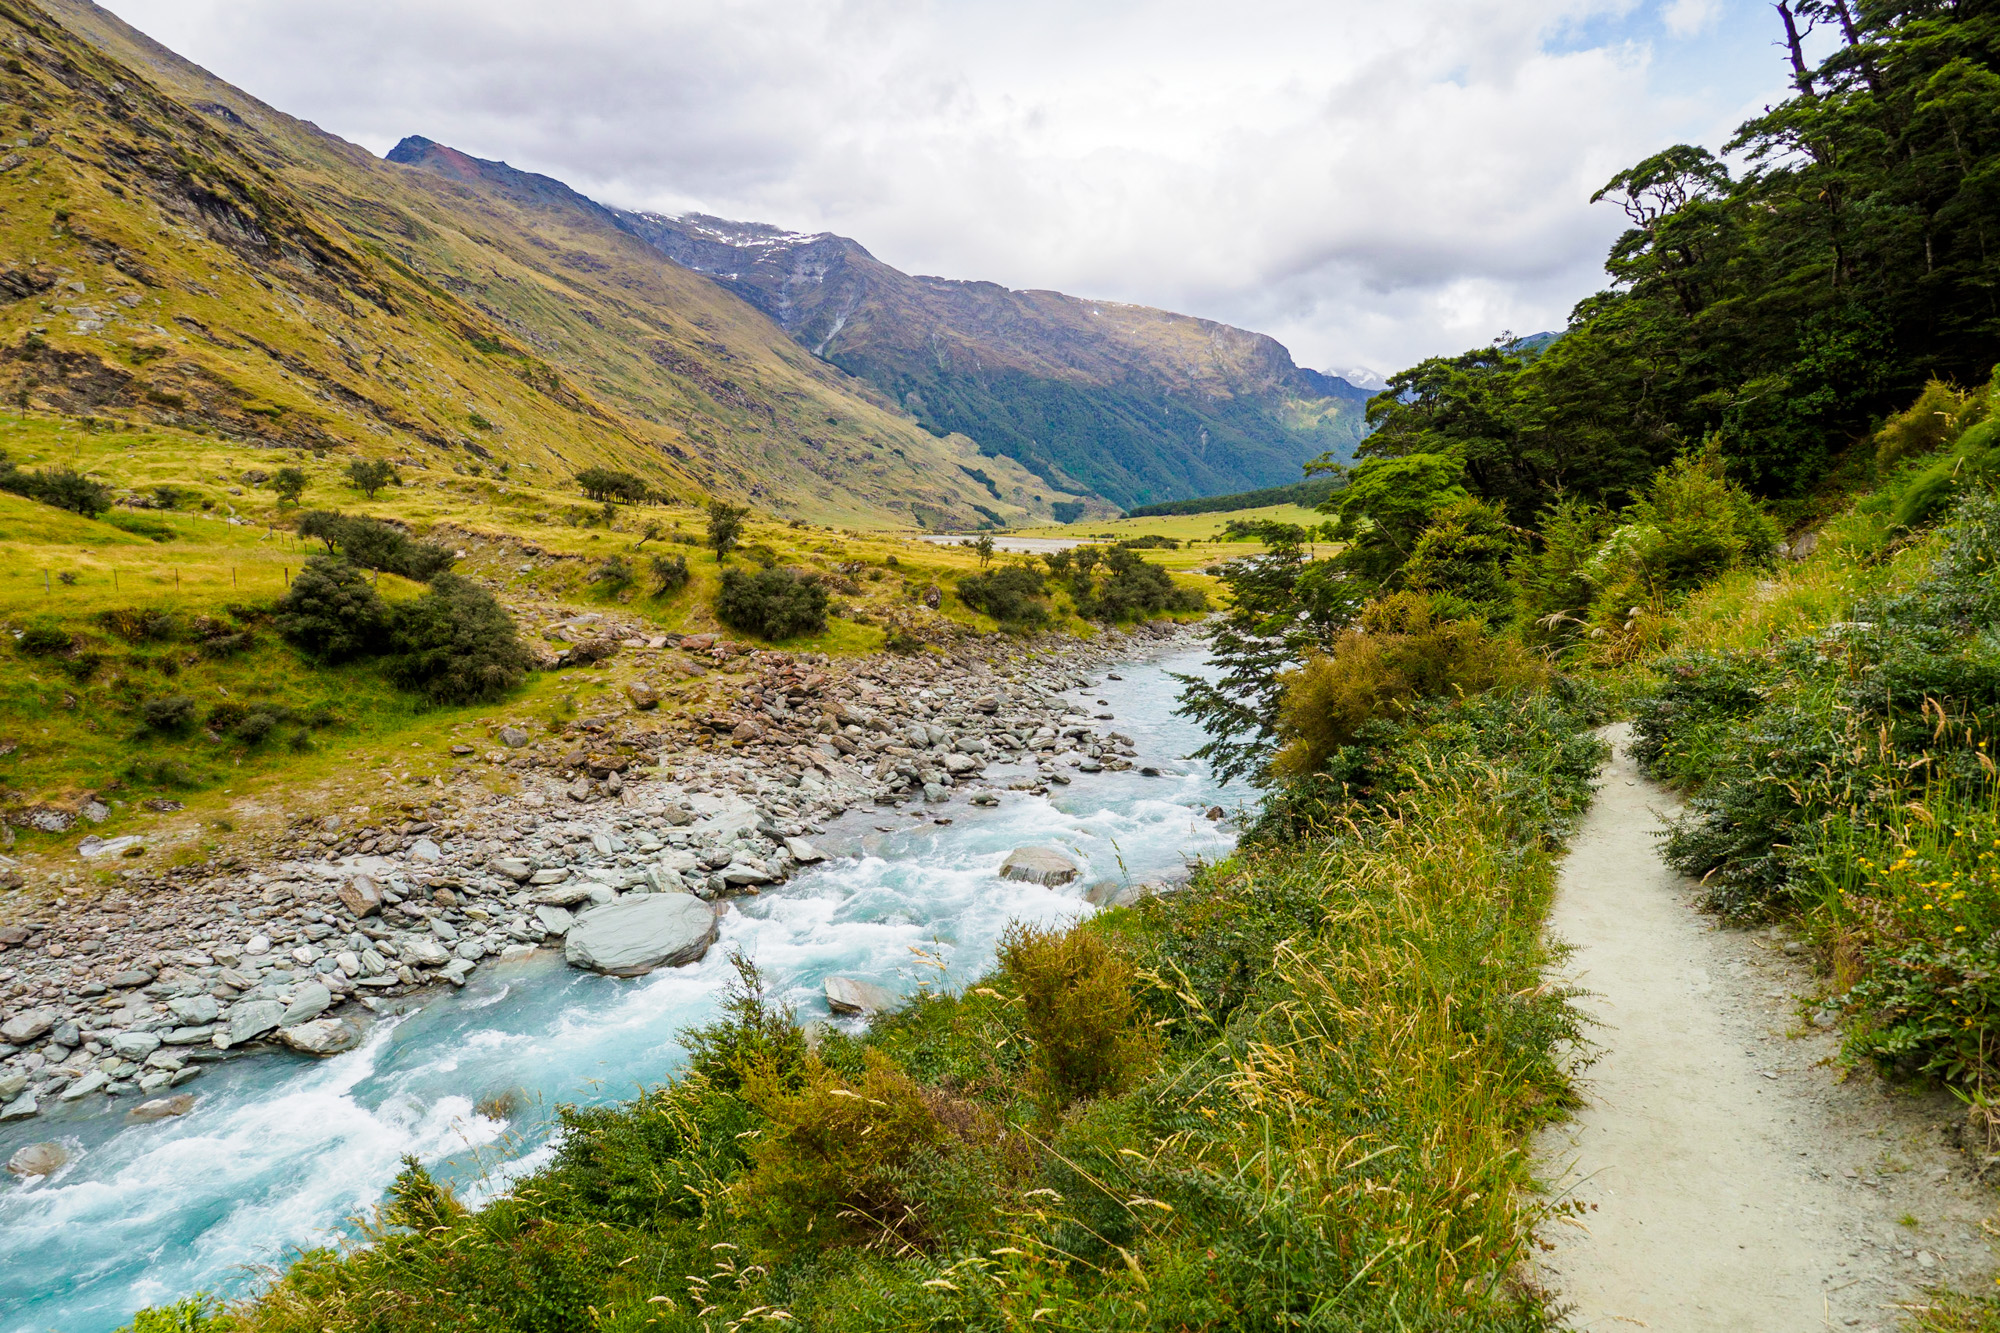 Wanaka - Wanderweg zum Rob Roy Glacier